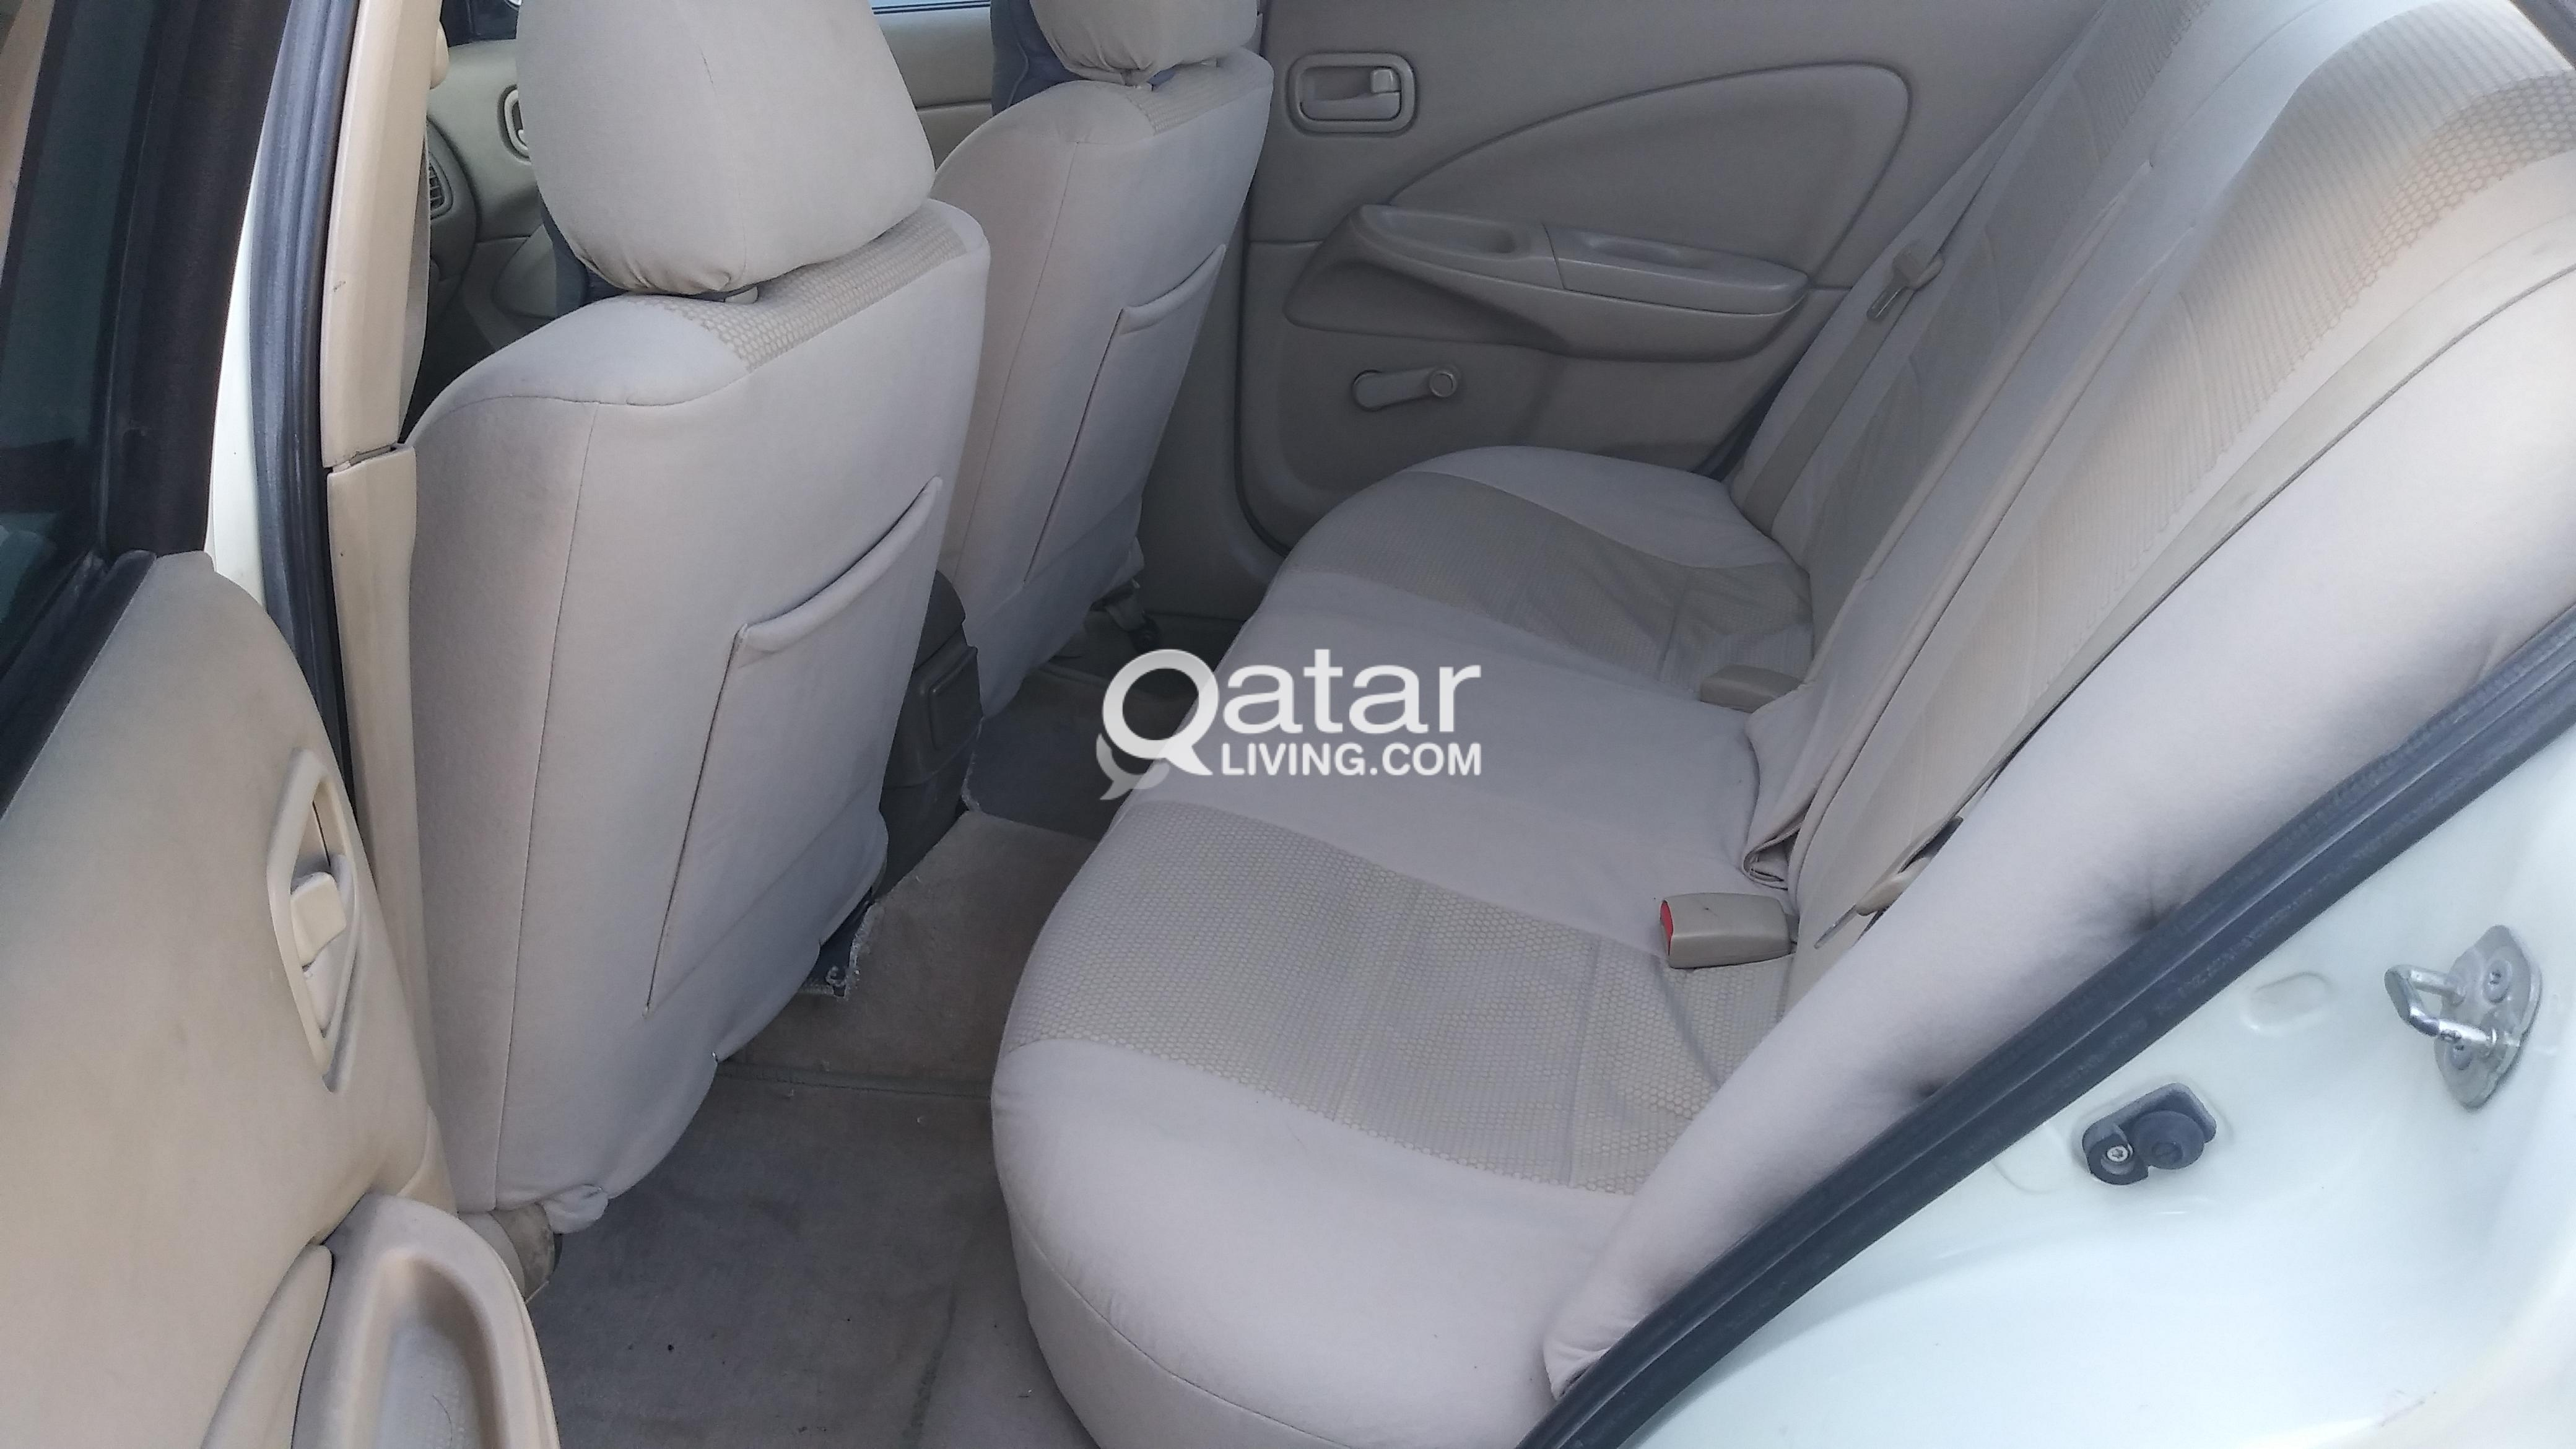 Nissan Sunny Japan 2009 Contact No 33134186 Qatar Living